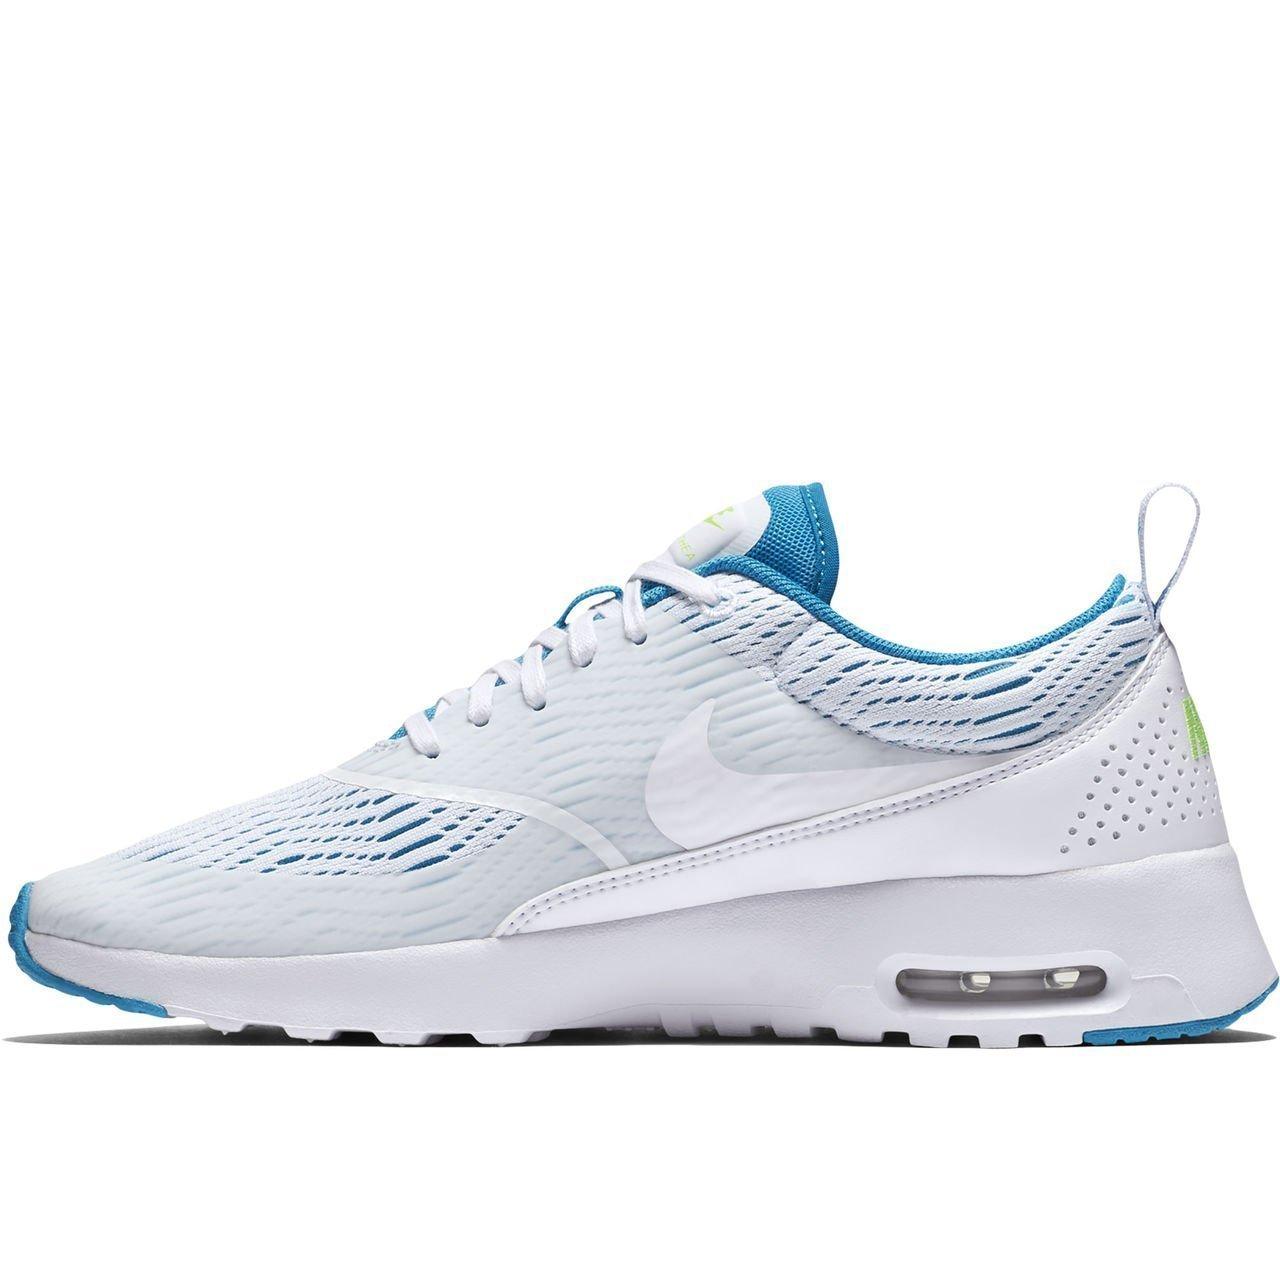 newest ba7cd 827c6 Galleon - NIKE Women s Air Max Thea EM Running Shoes 833887-100, US Women  5.5